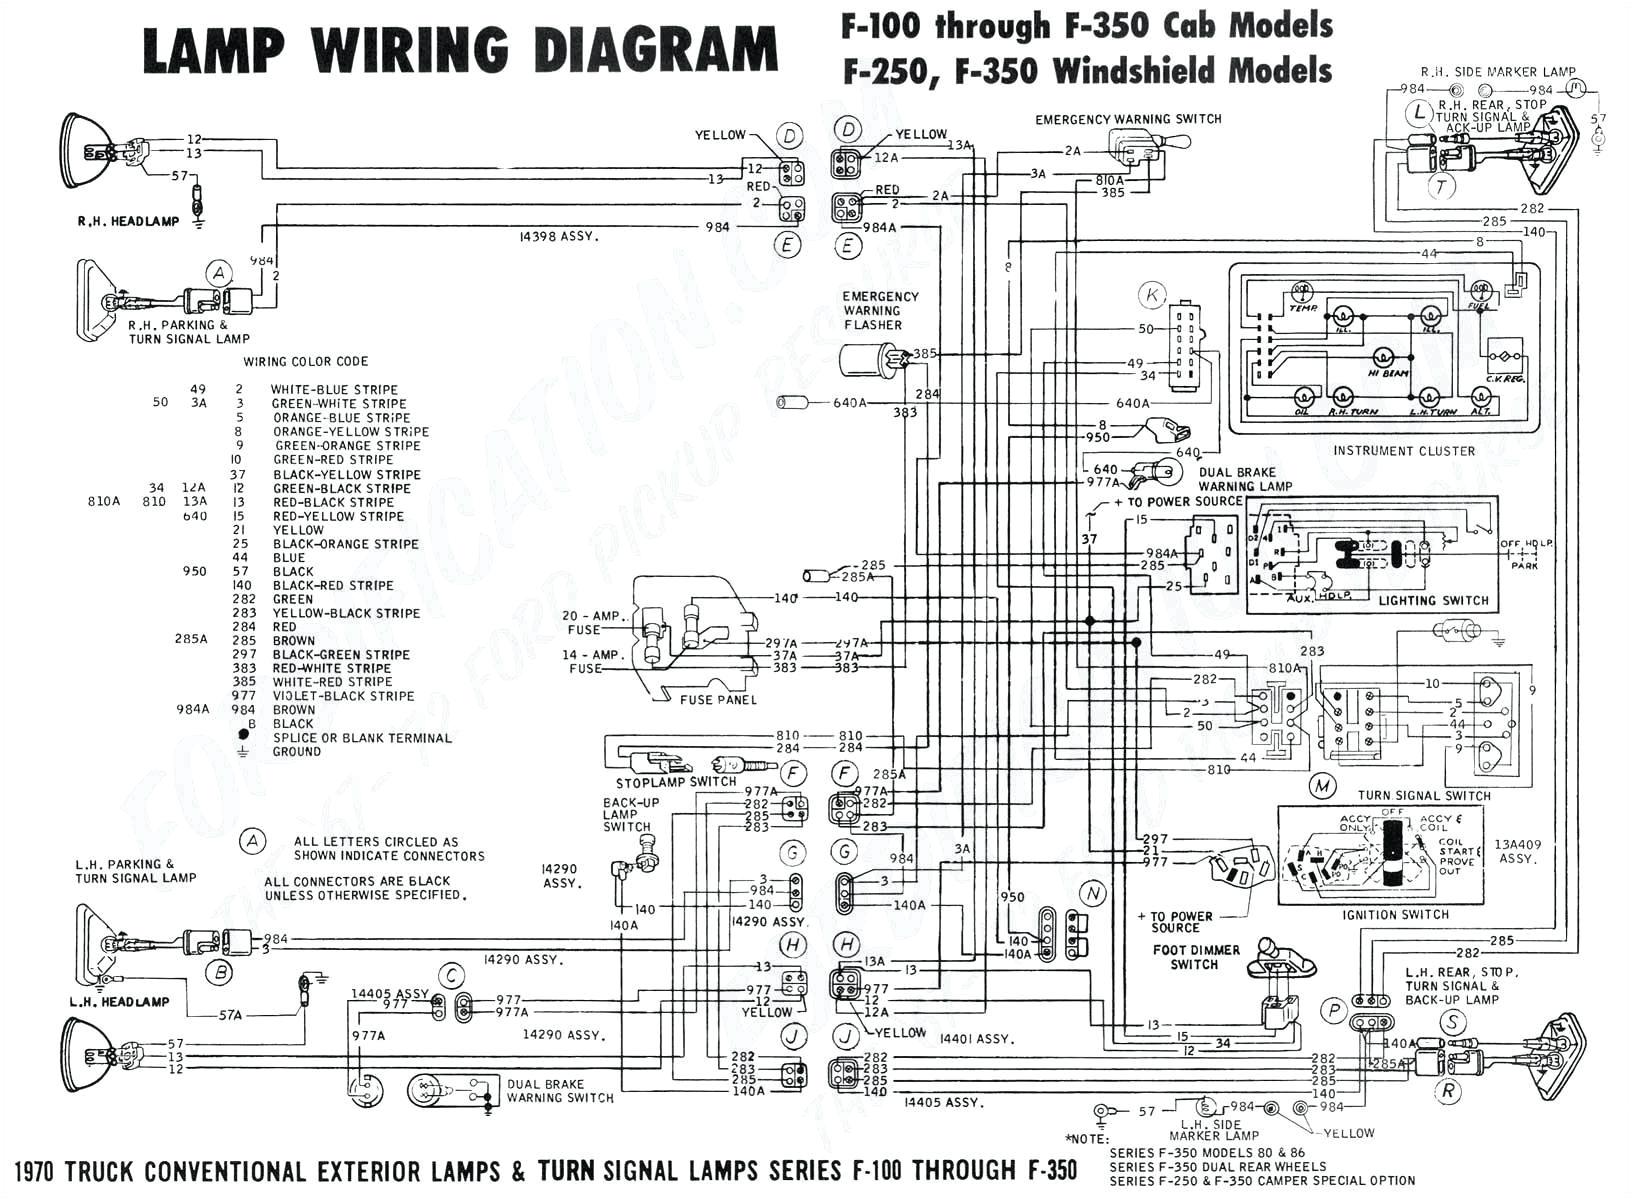 2003 Hyundai Santa Fe Wiring Diagram Hei Ignition Wiring Diagram C2 Ab Auto Hardware Wiring Diagram Ame